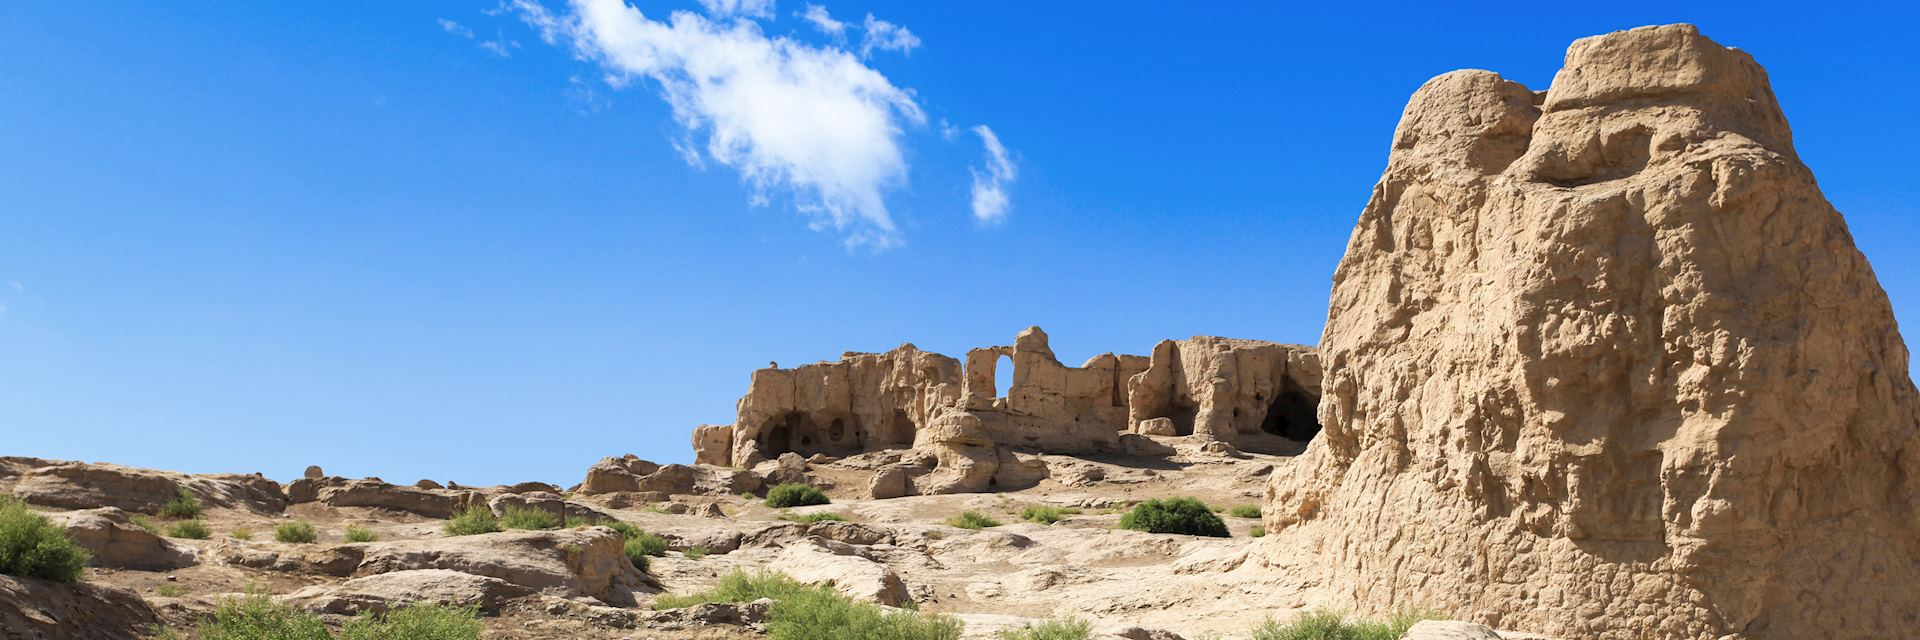 Jiaohe ruins in Turpan